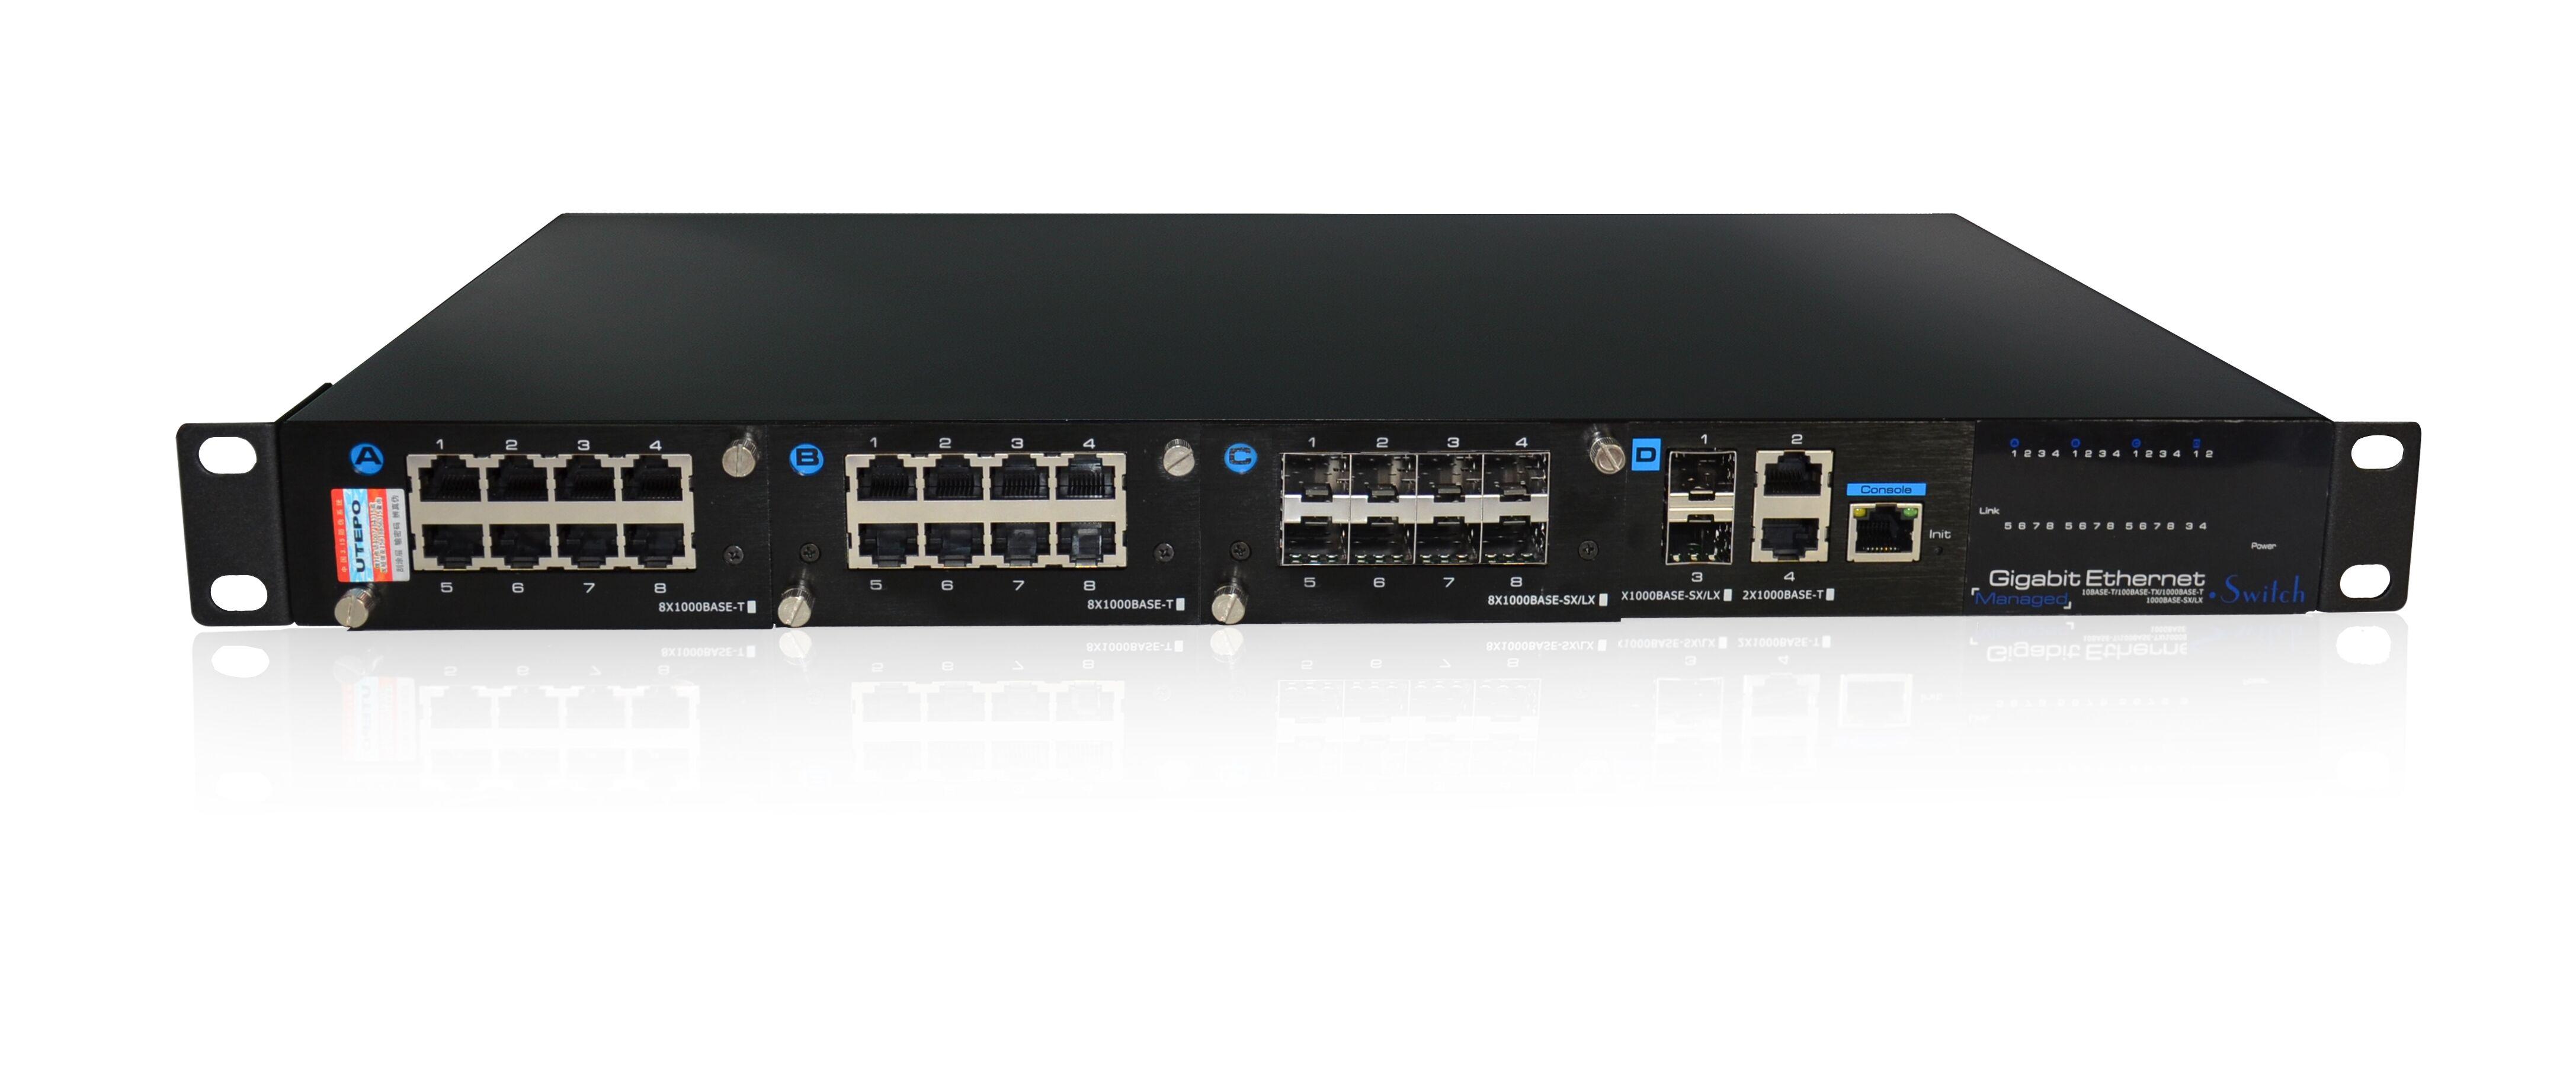 UTP7524GE-MX